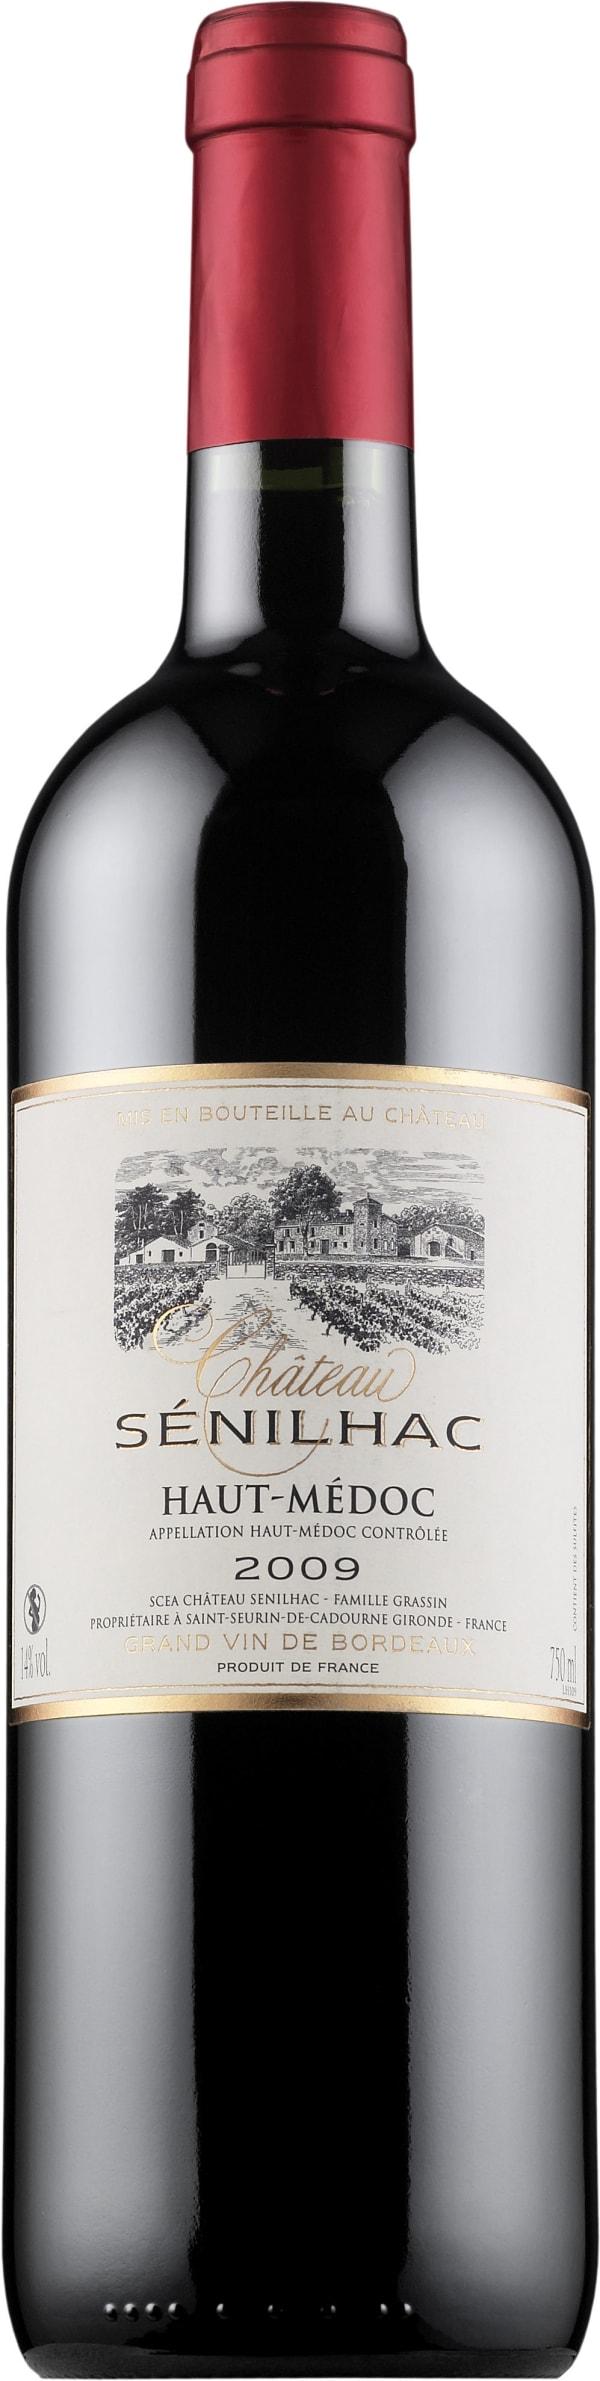 Château Sénilhac 2012